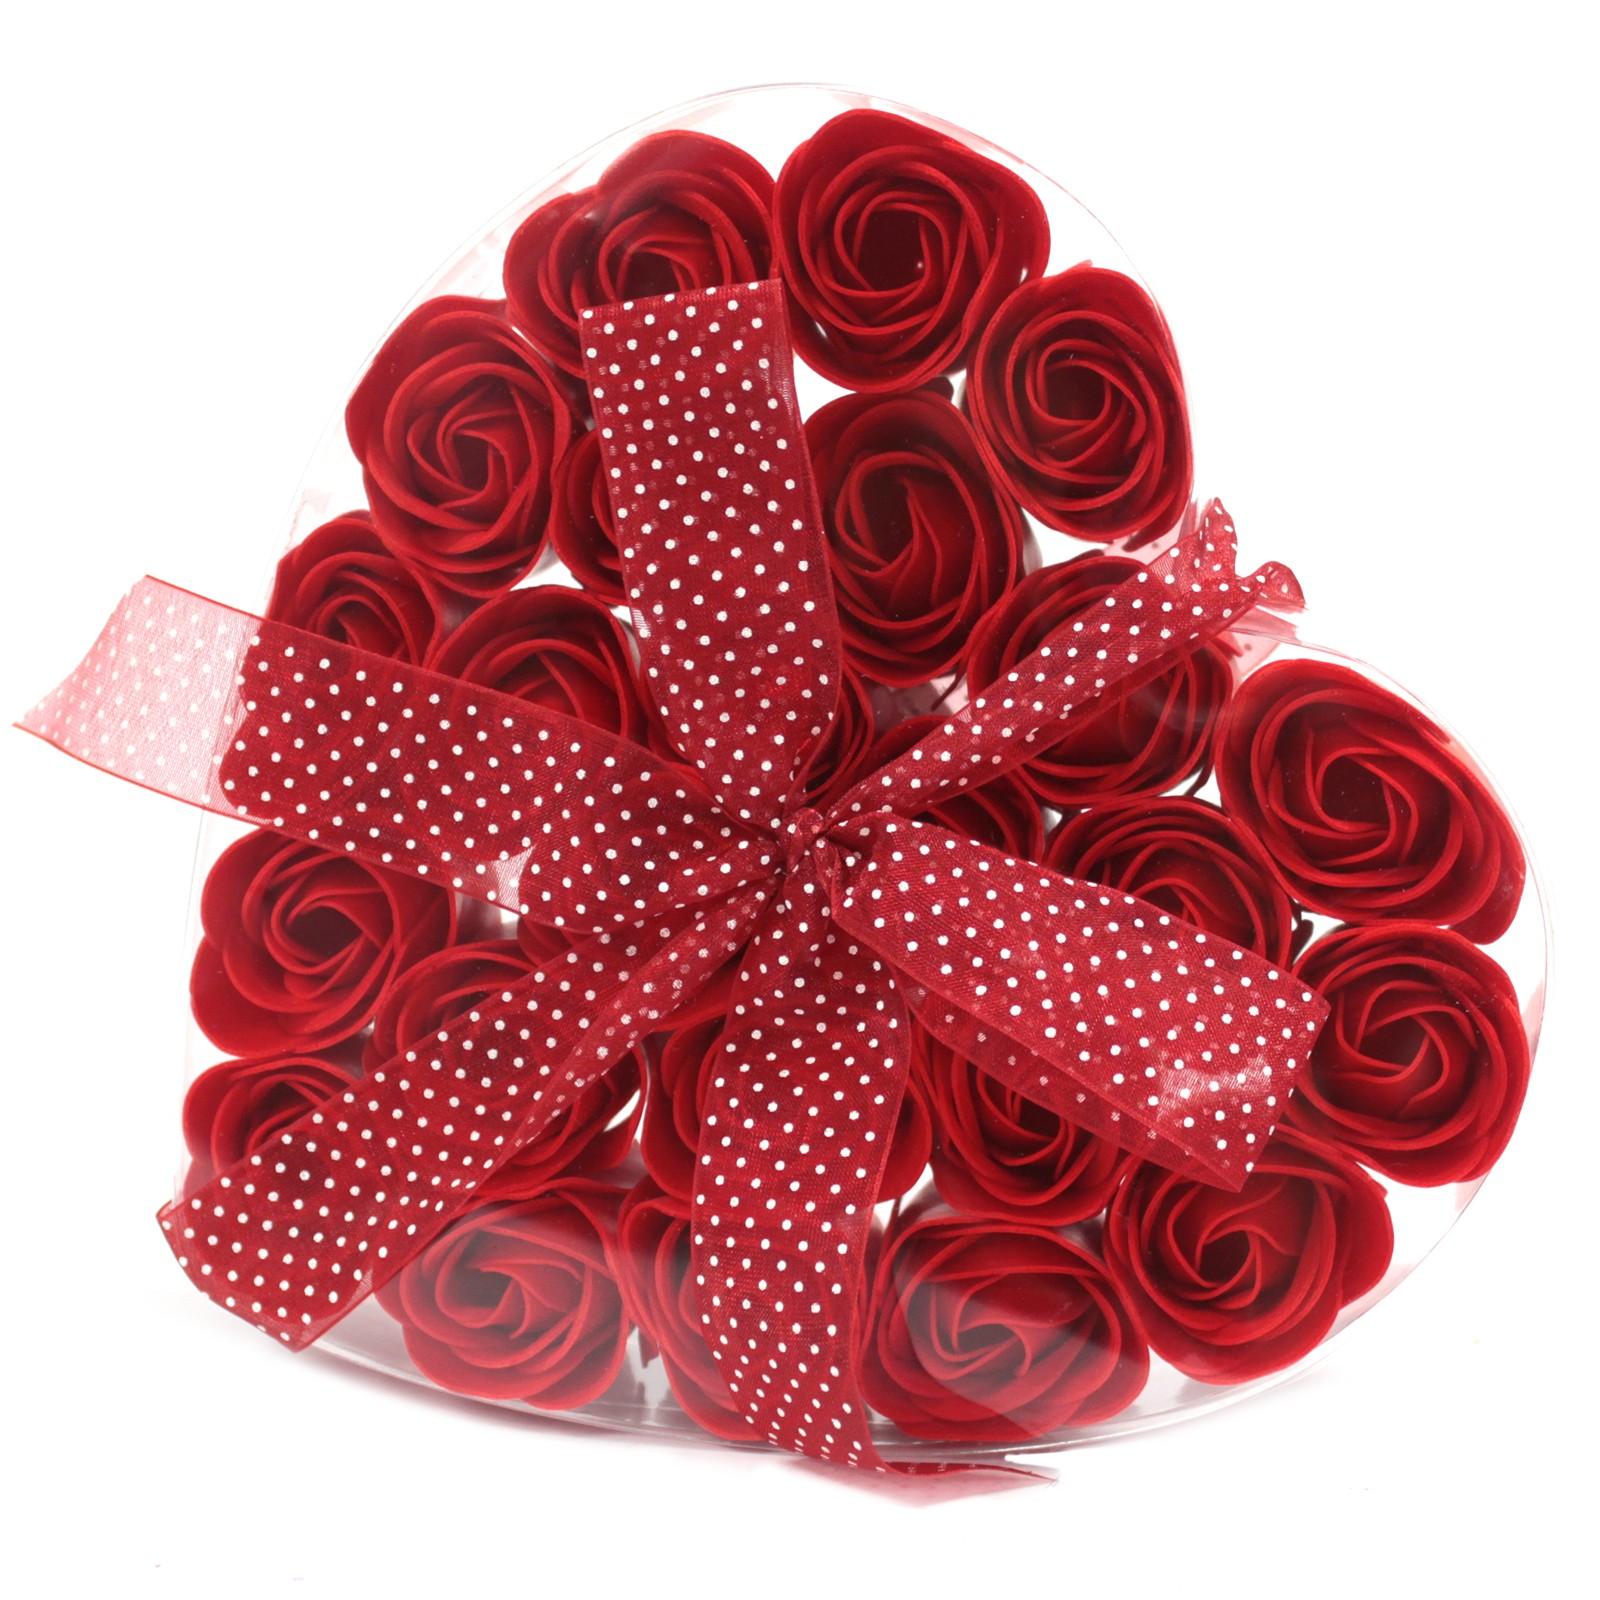 Set of 24 Soap Flower Heart Box Red Roses